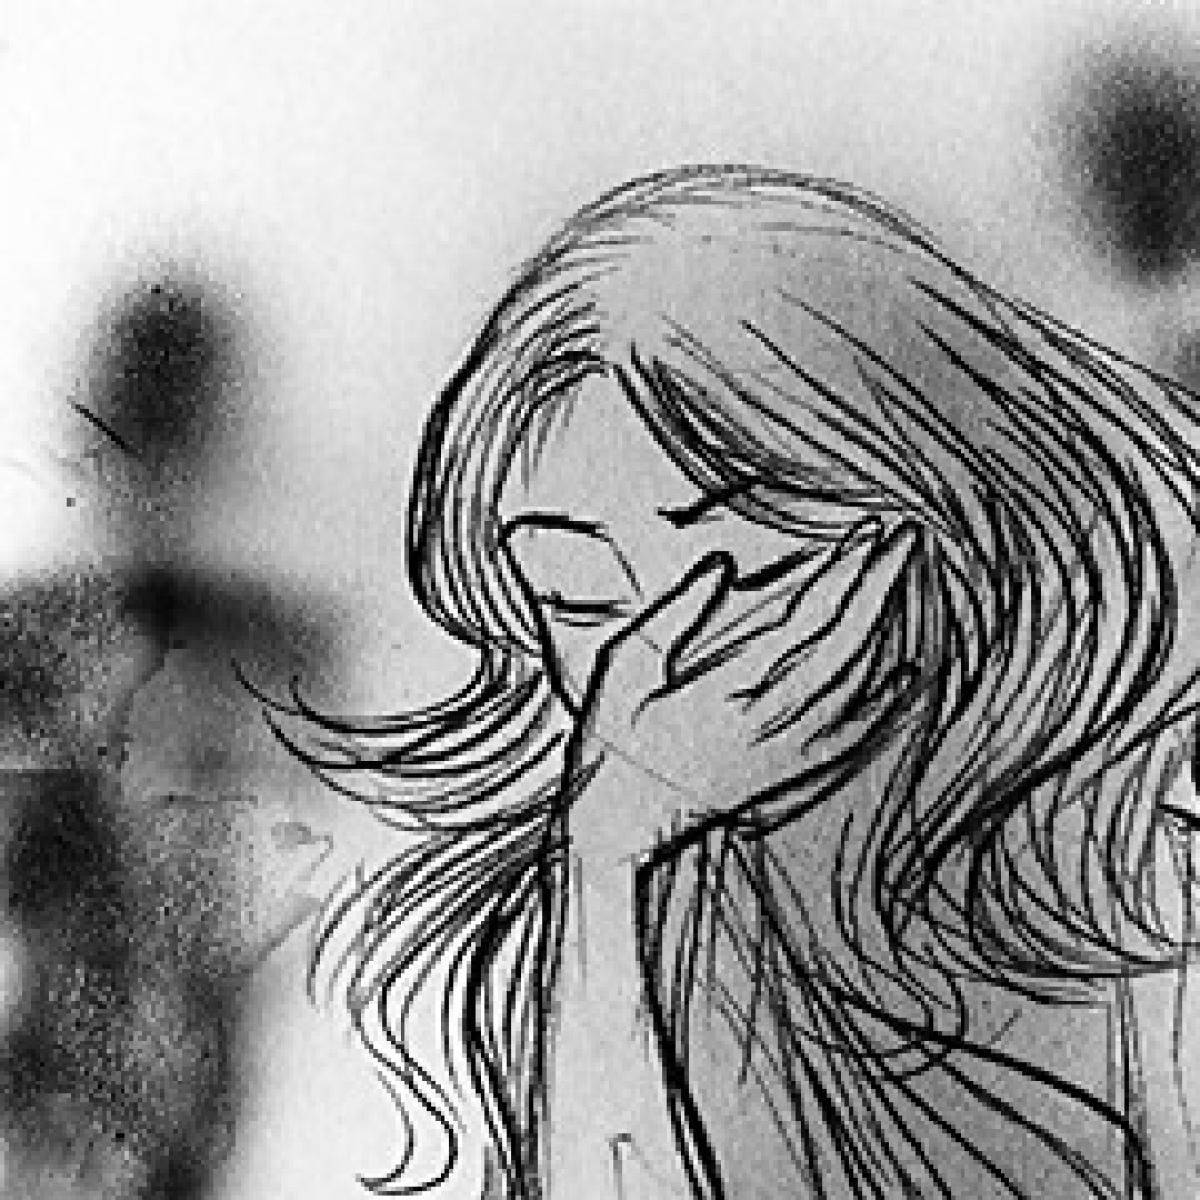 Rape case filed against Kalyan businessman